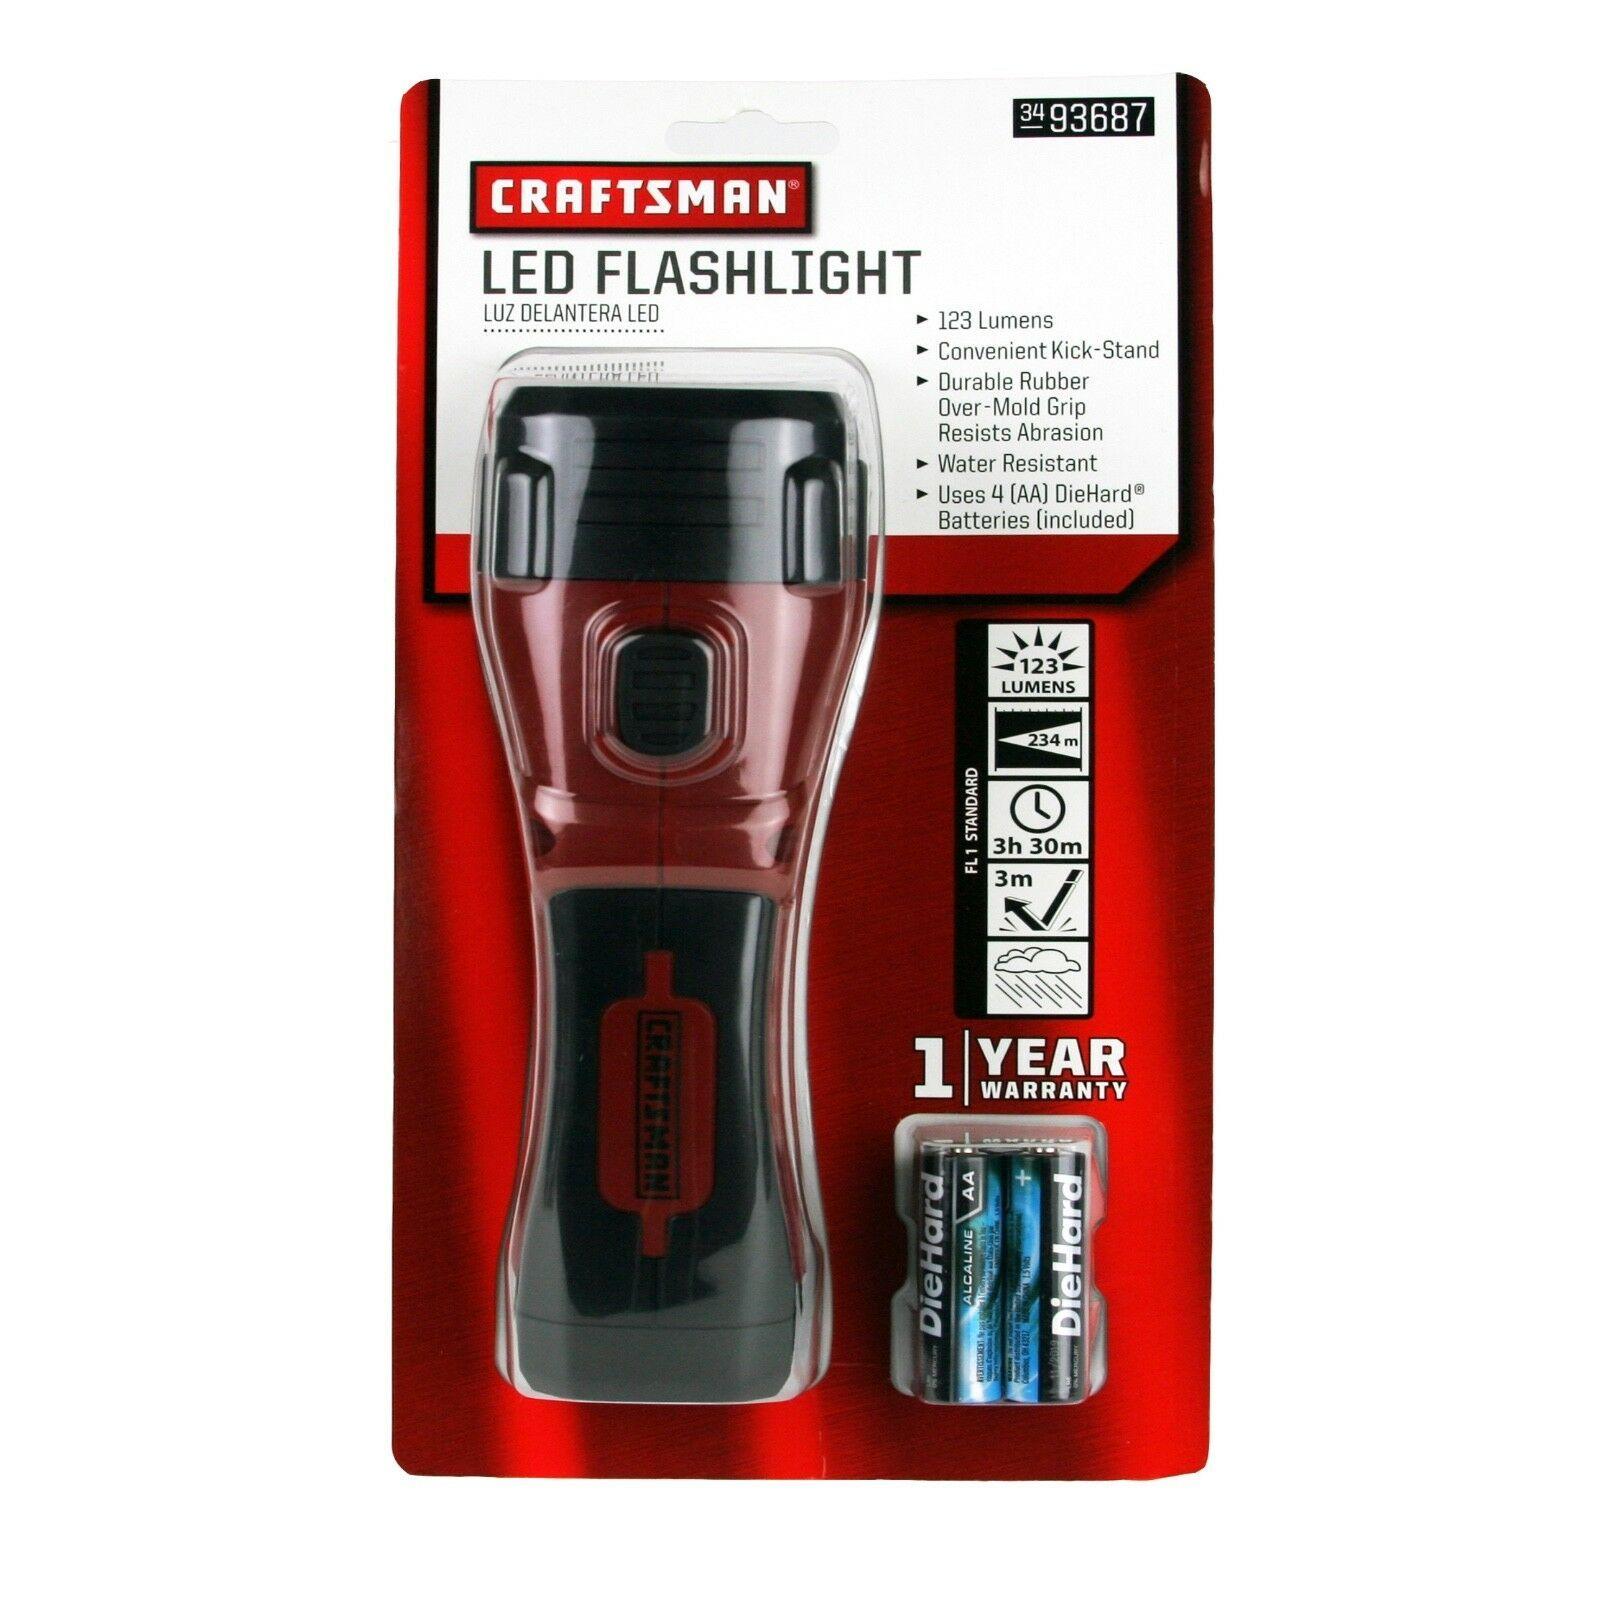 Craftsman 4AA LED Flashlight - $25.99